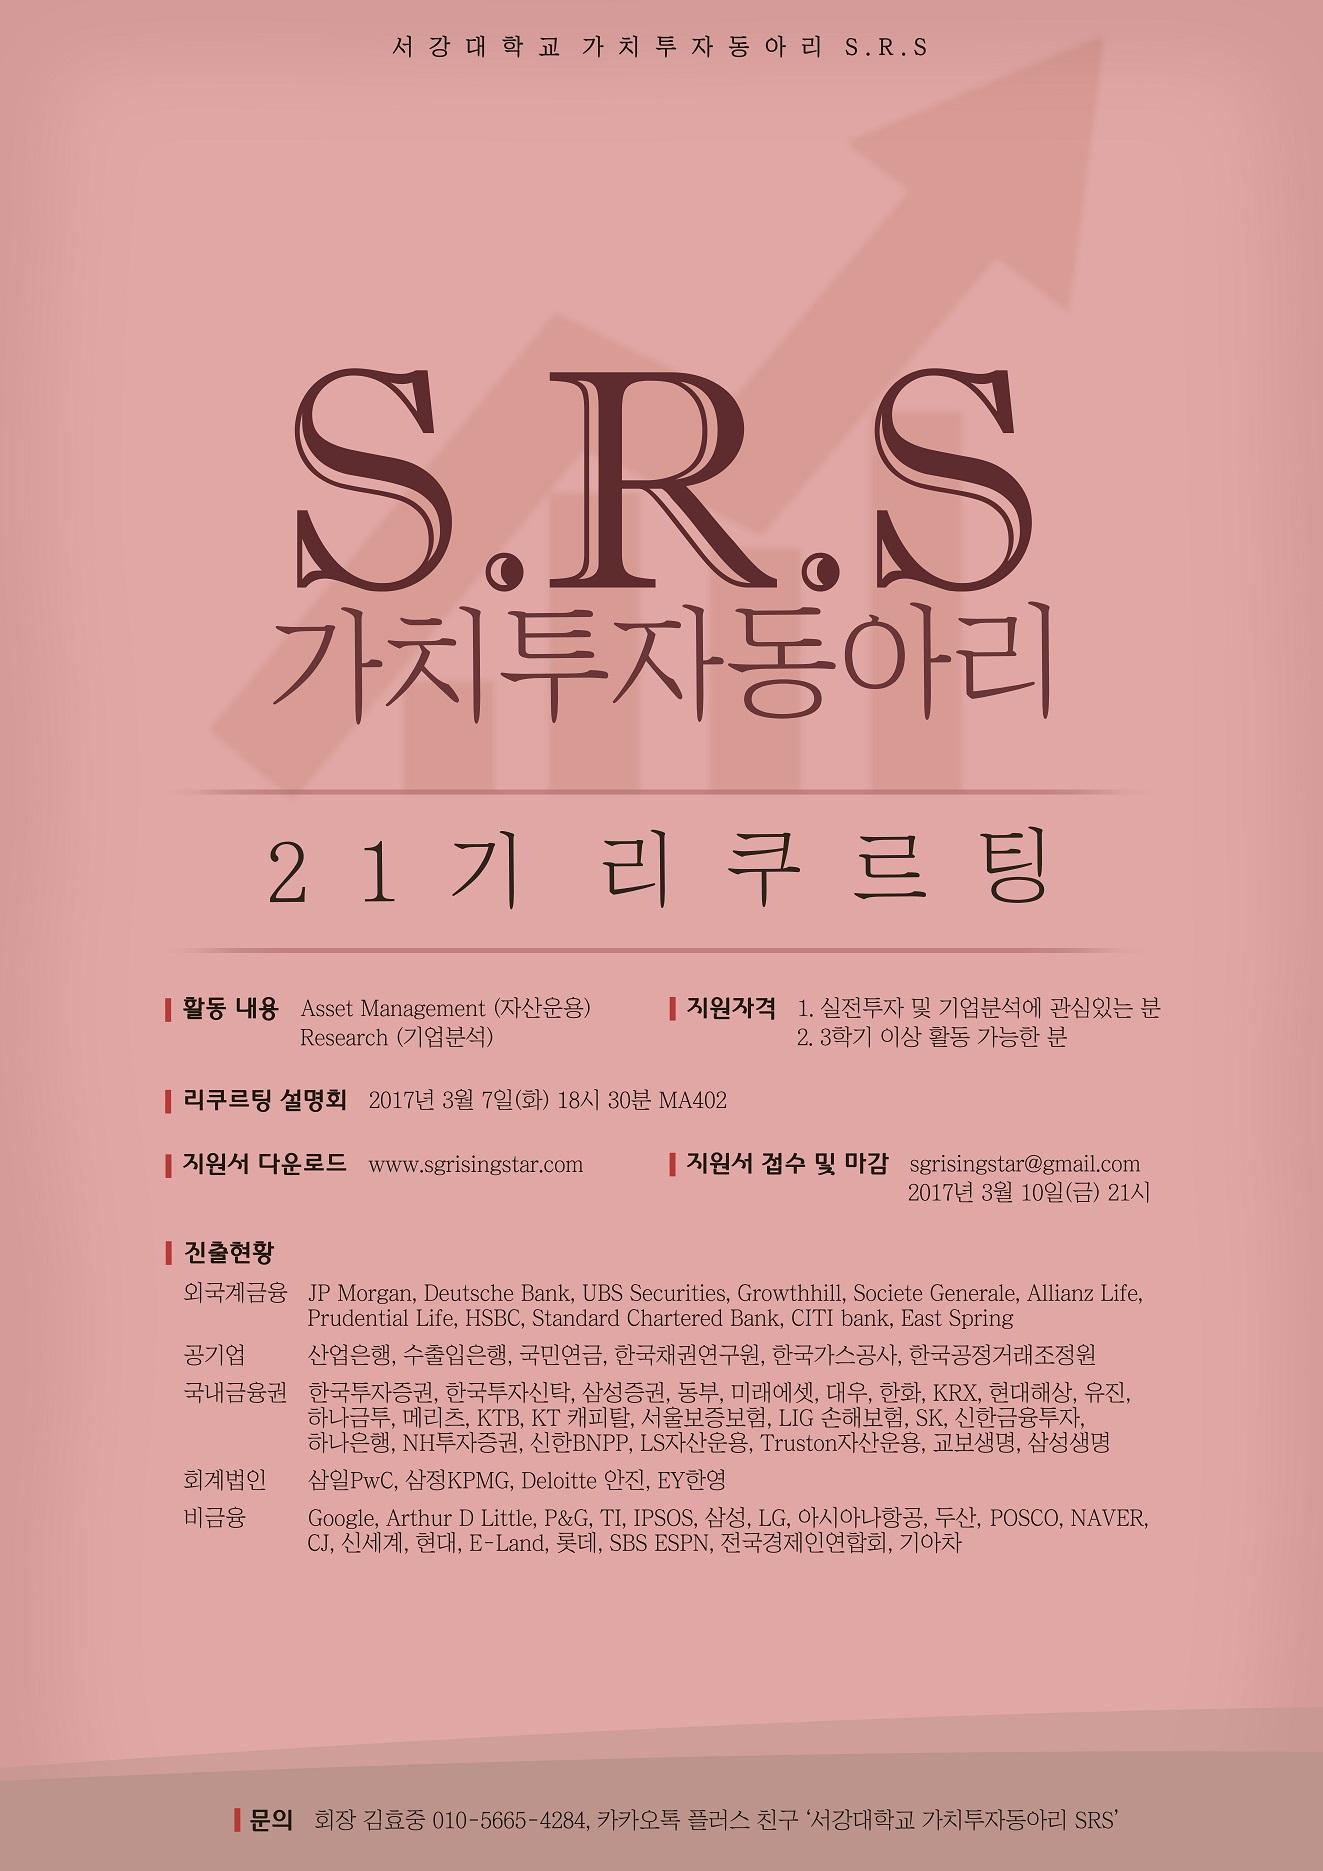 SRS 포스터 대형_크기조정.jpg